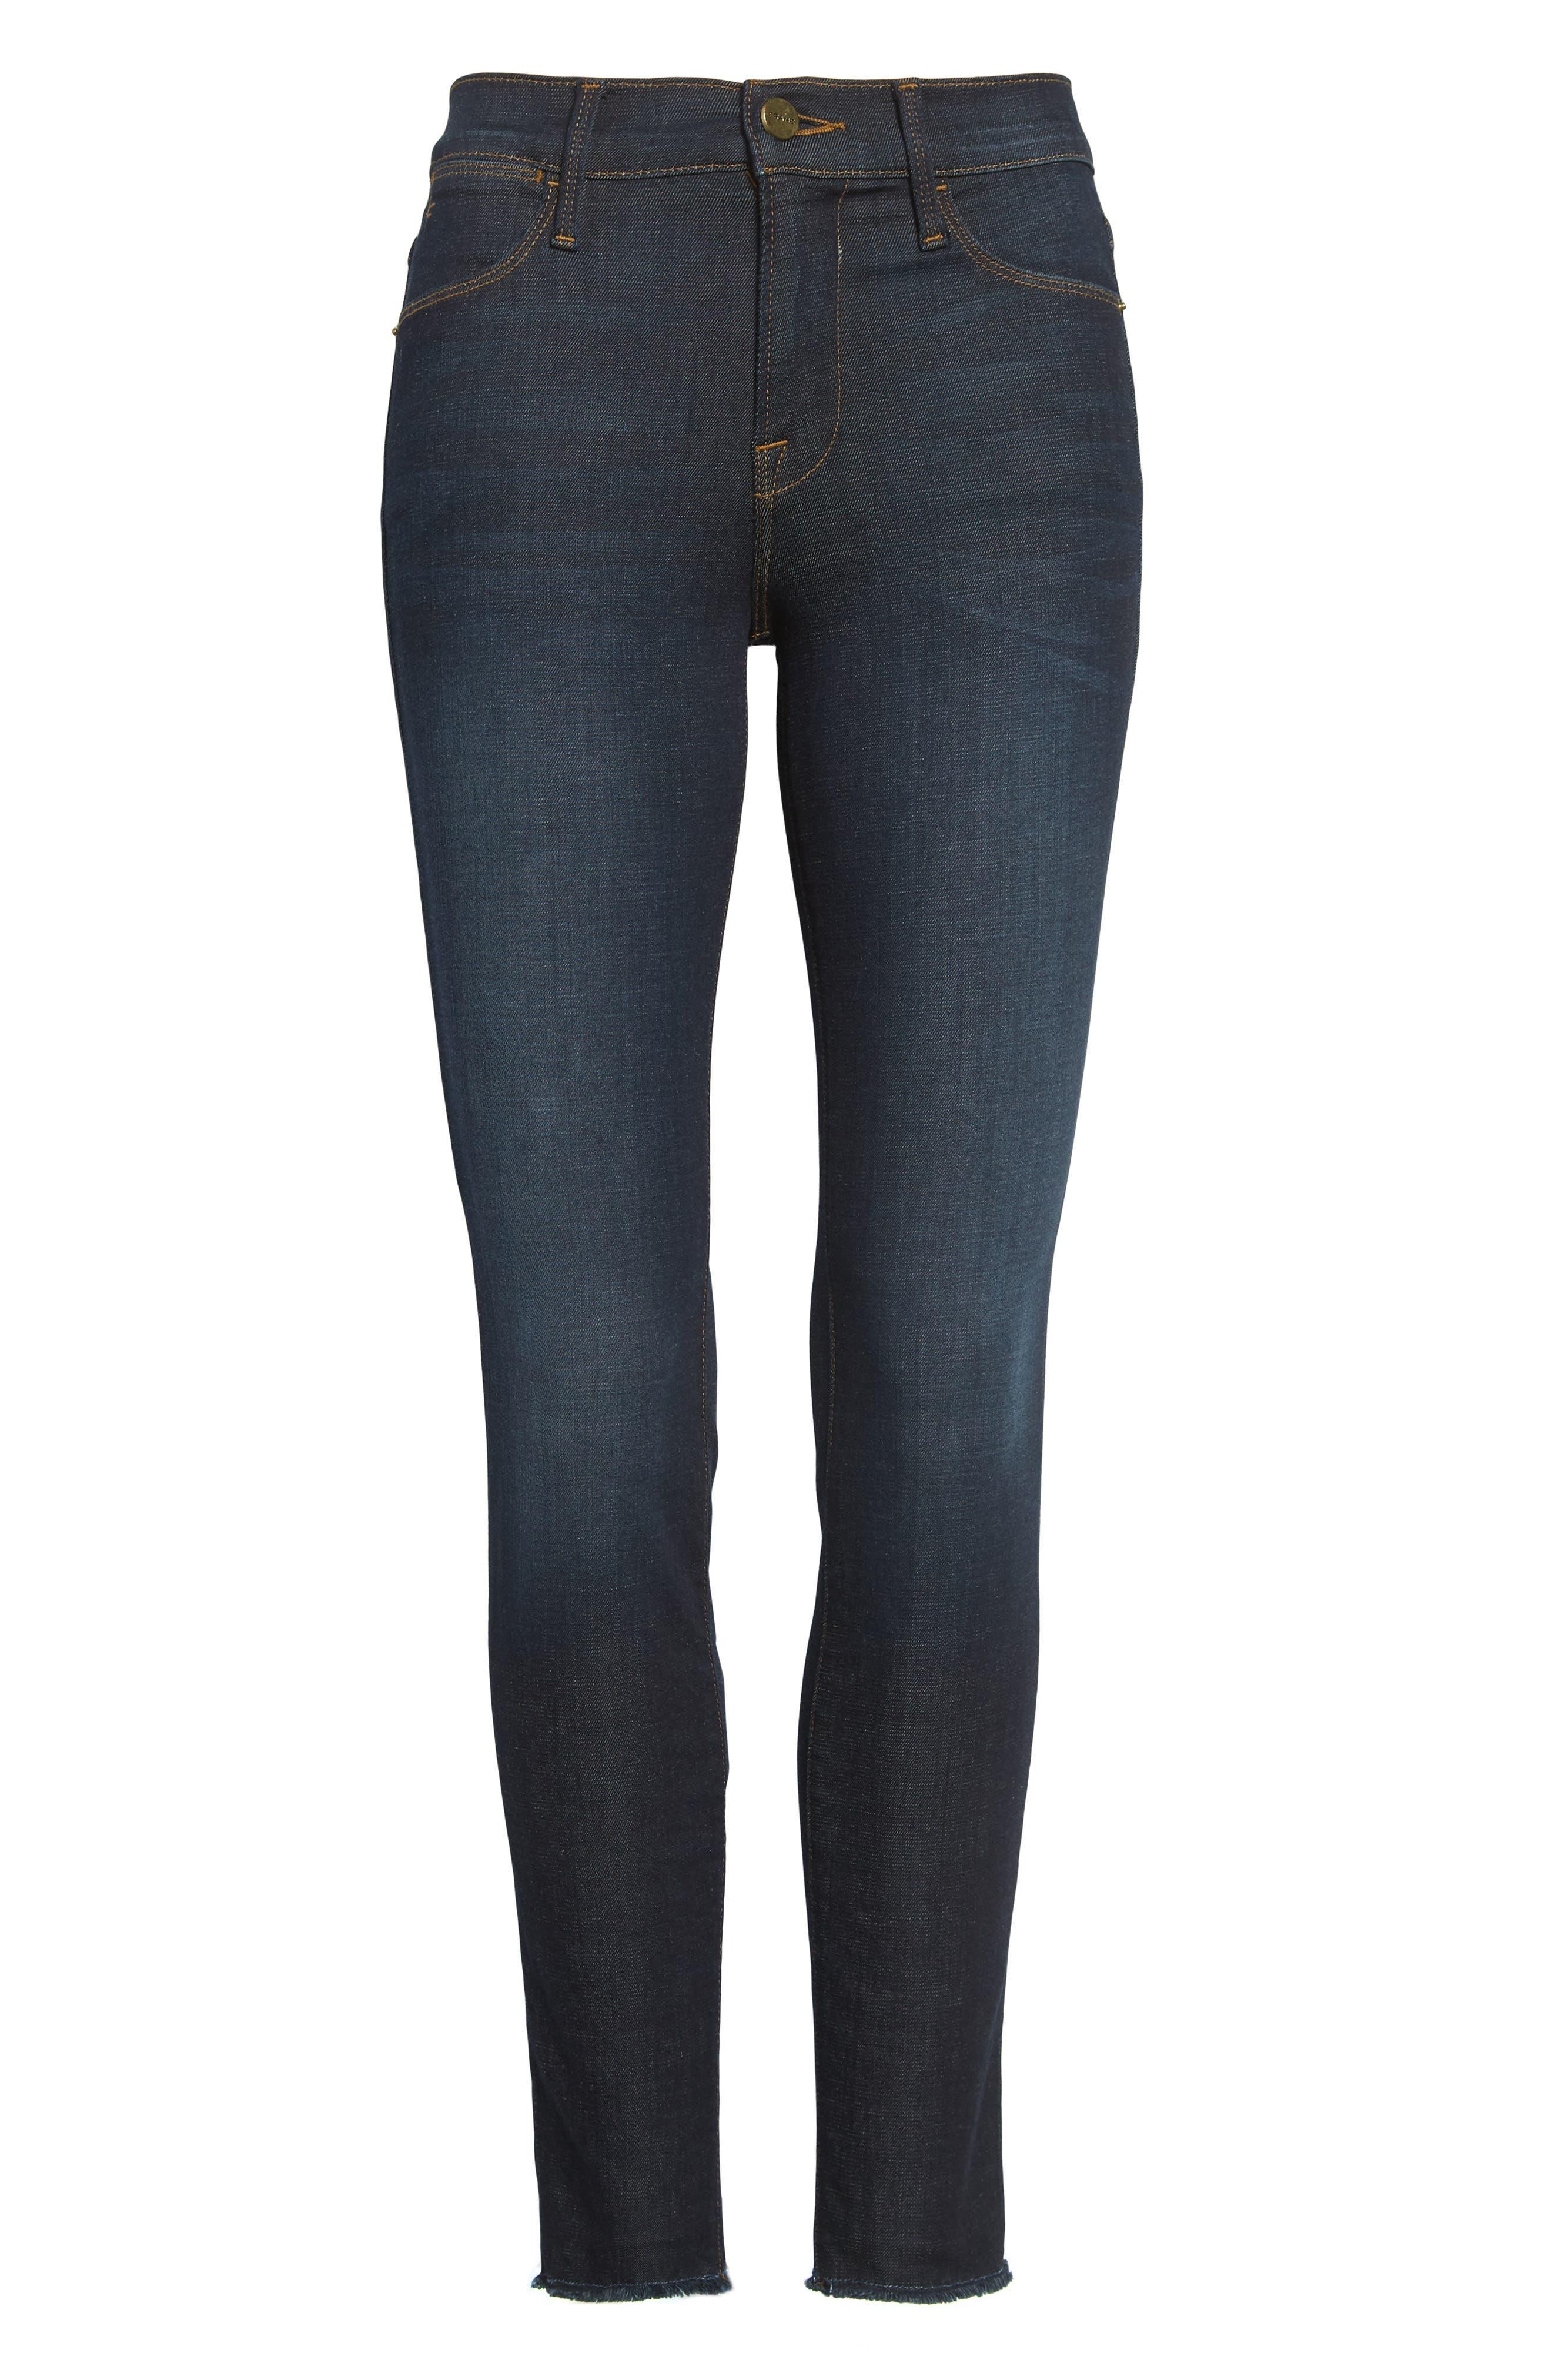 High Waist Skinny Jeans,                             Alternate thumbnail 2, color,                             SALTAIR